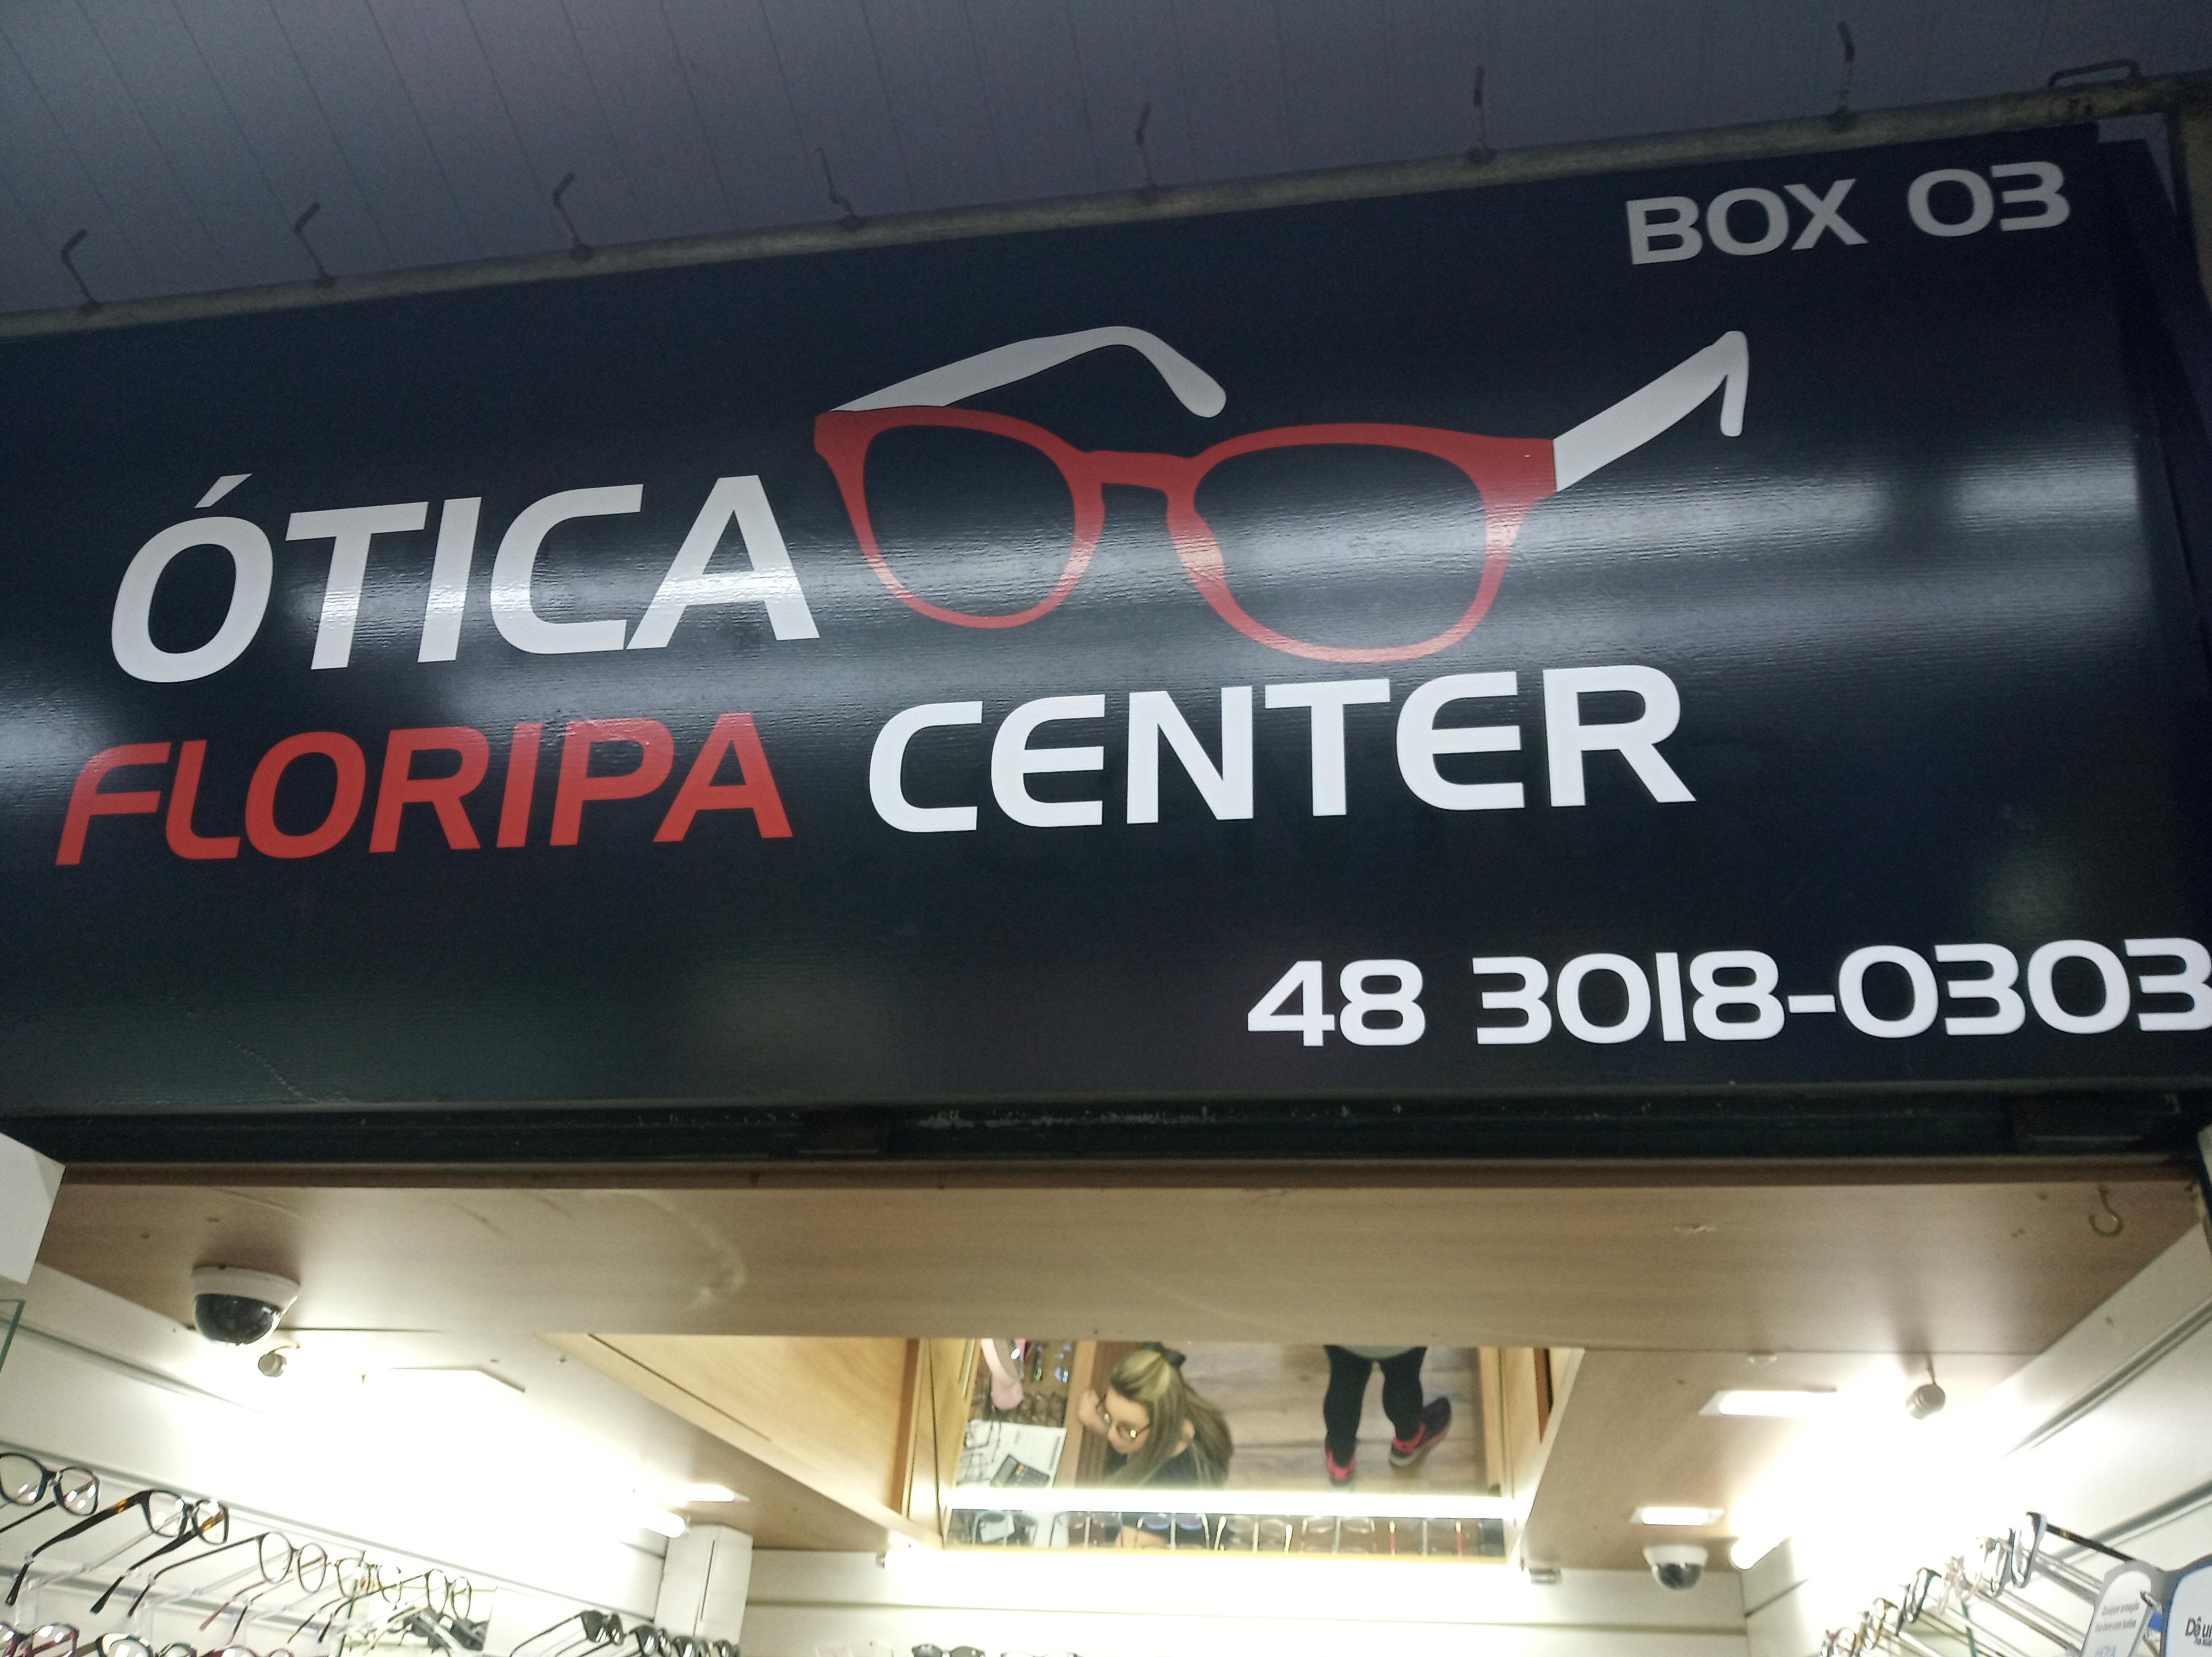 Floripa Center Otica 03